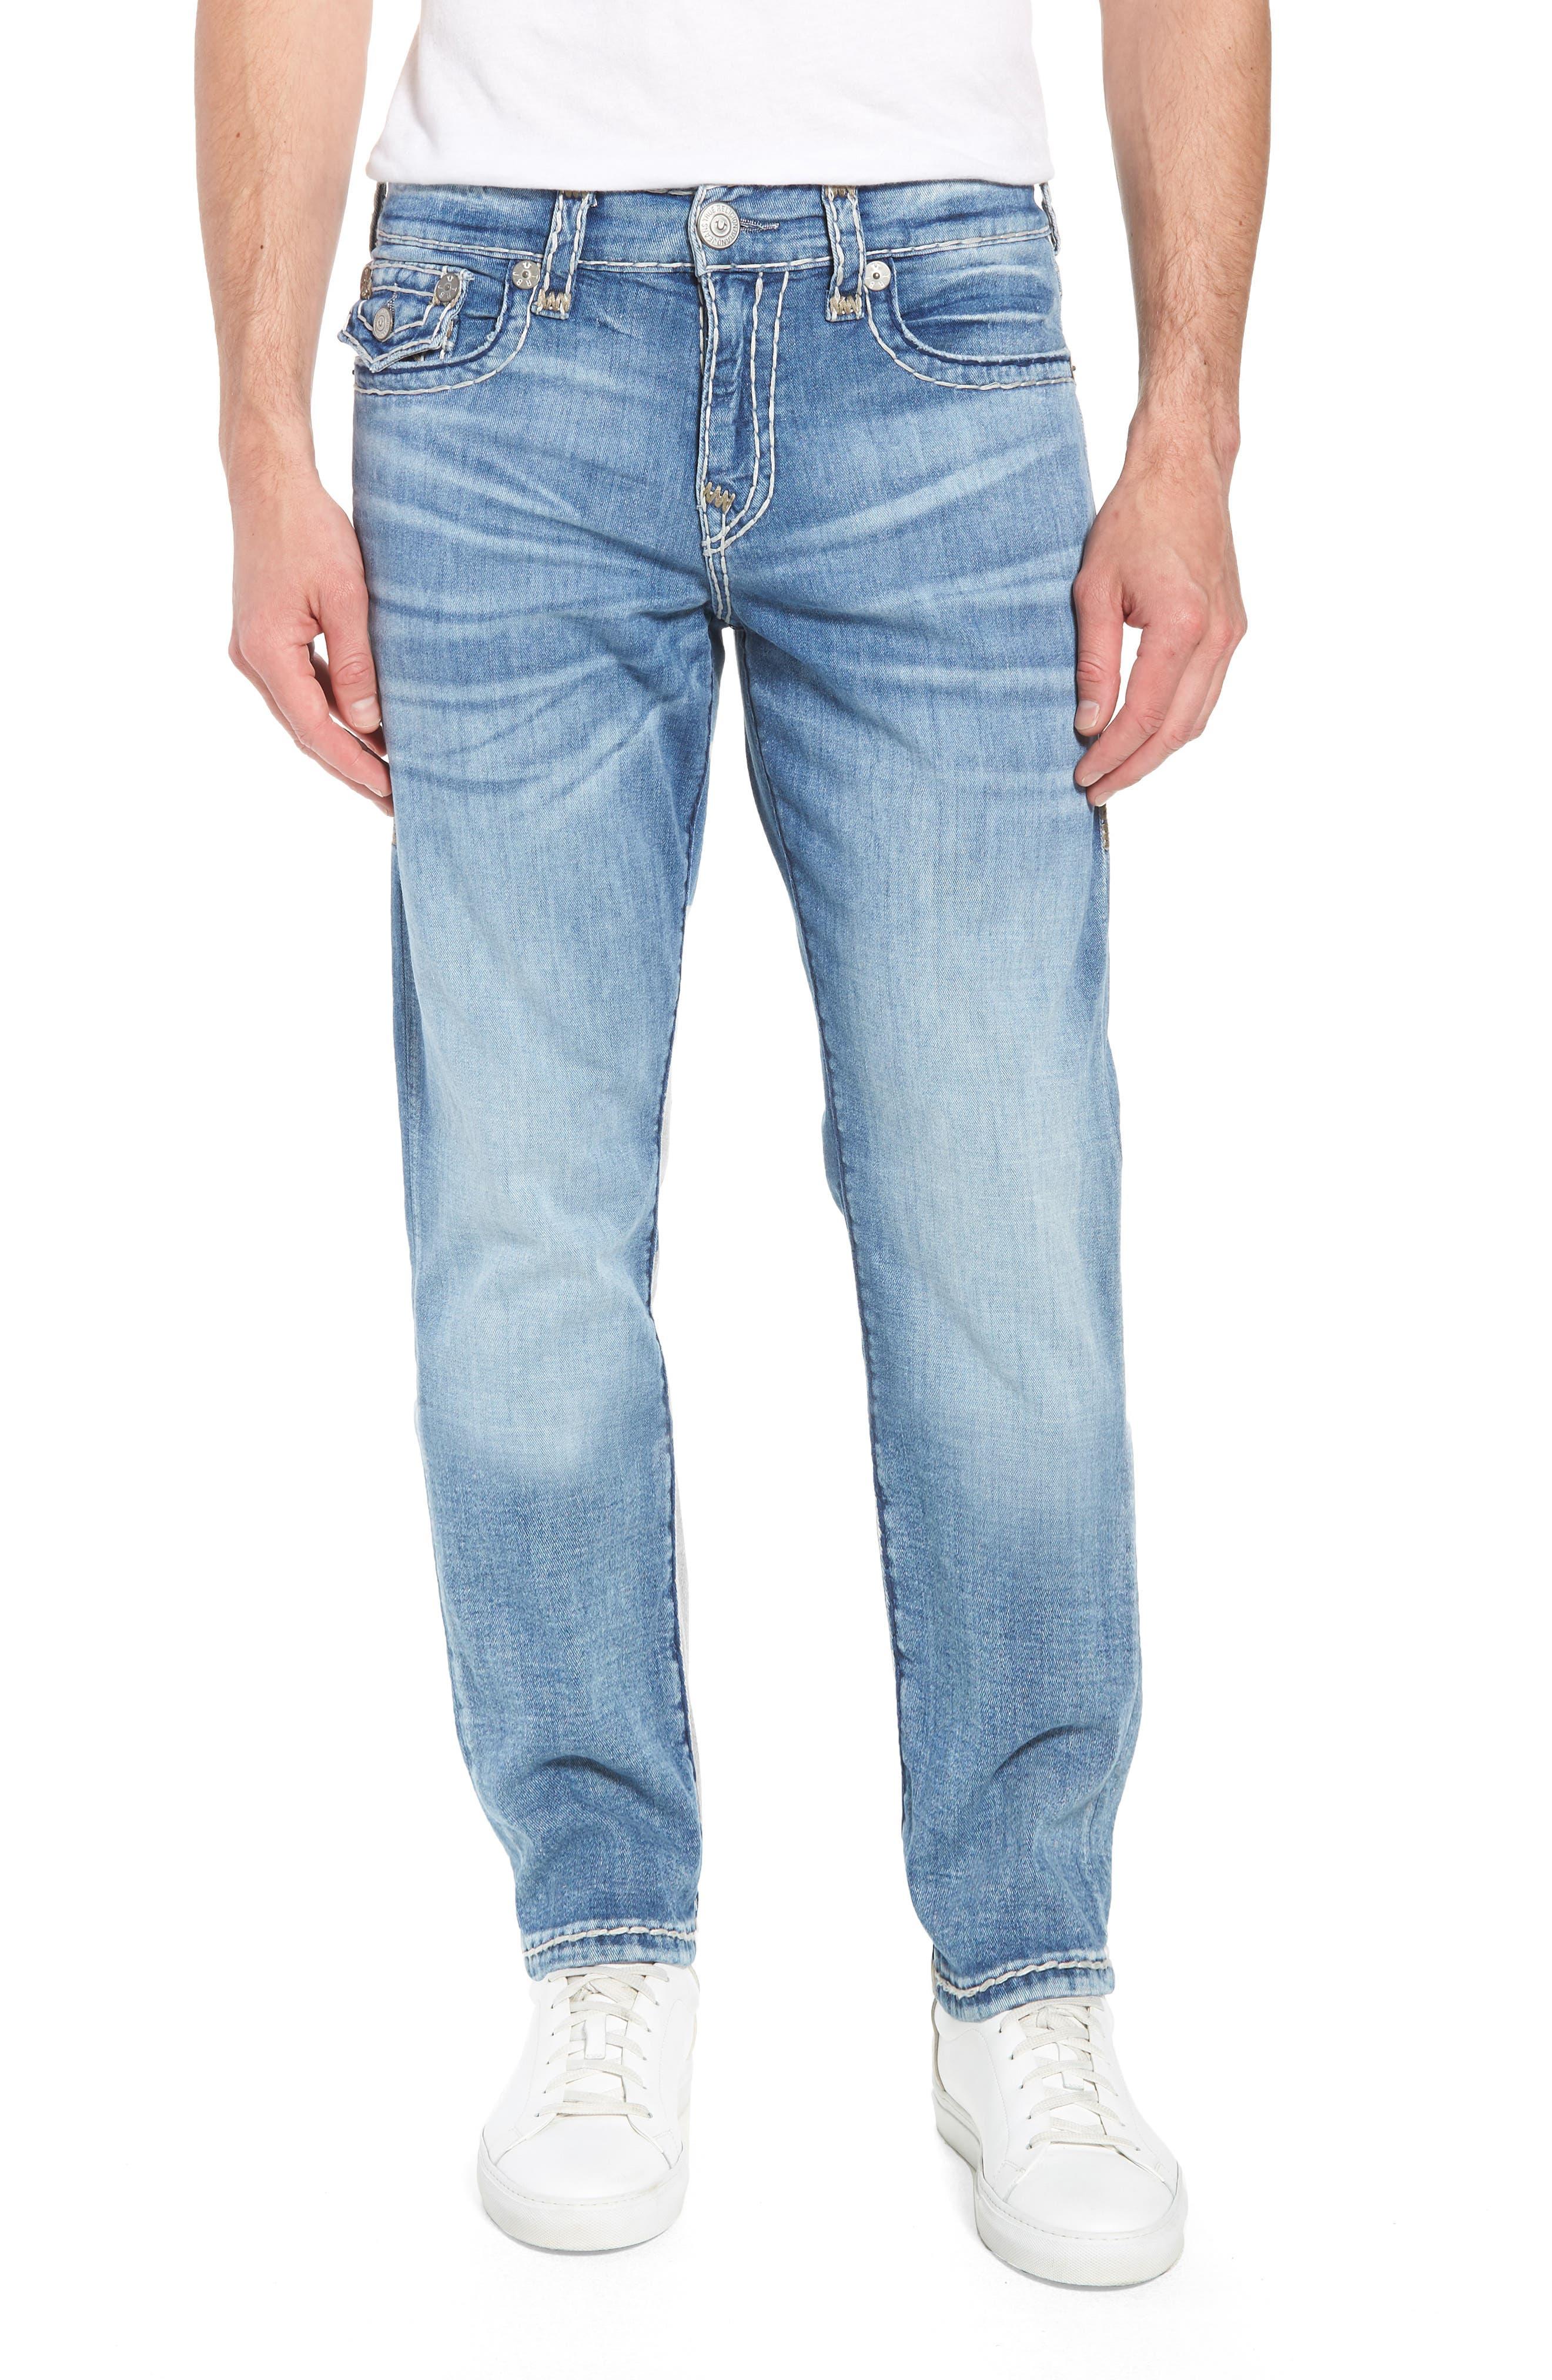 Geno Straight Leg Jeans,                         Main,                         color, Satellite